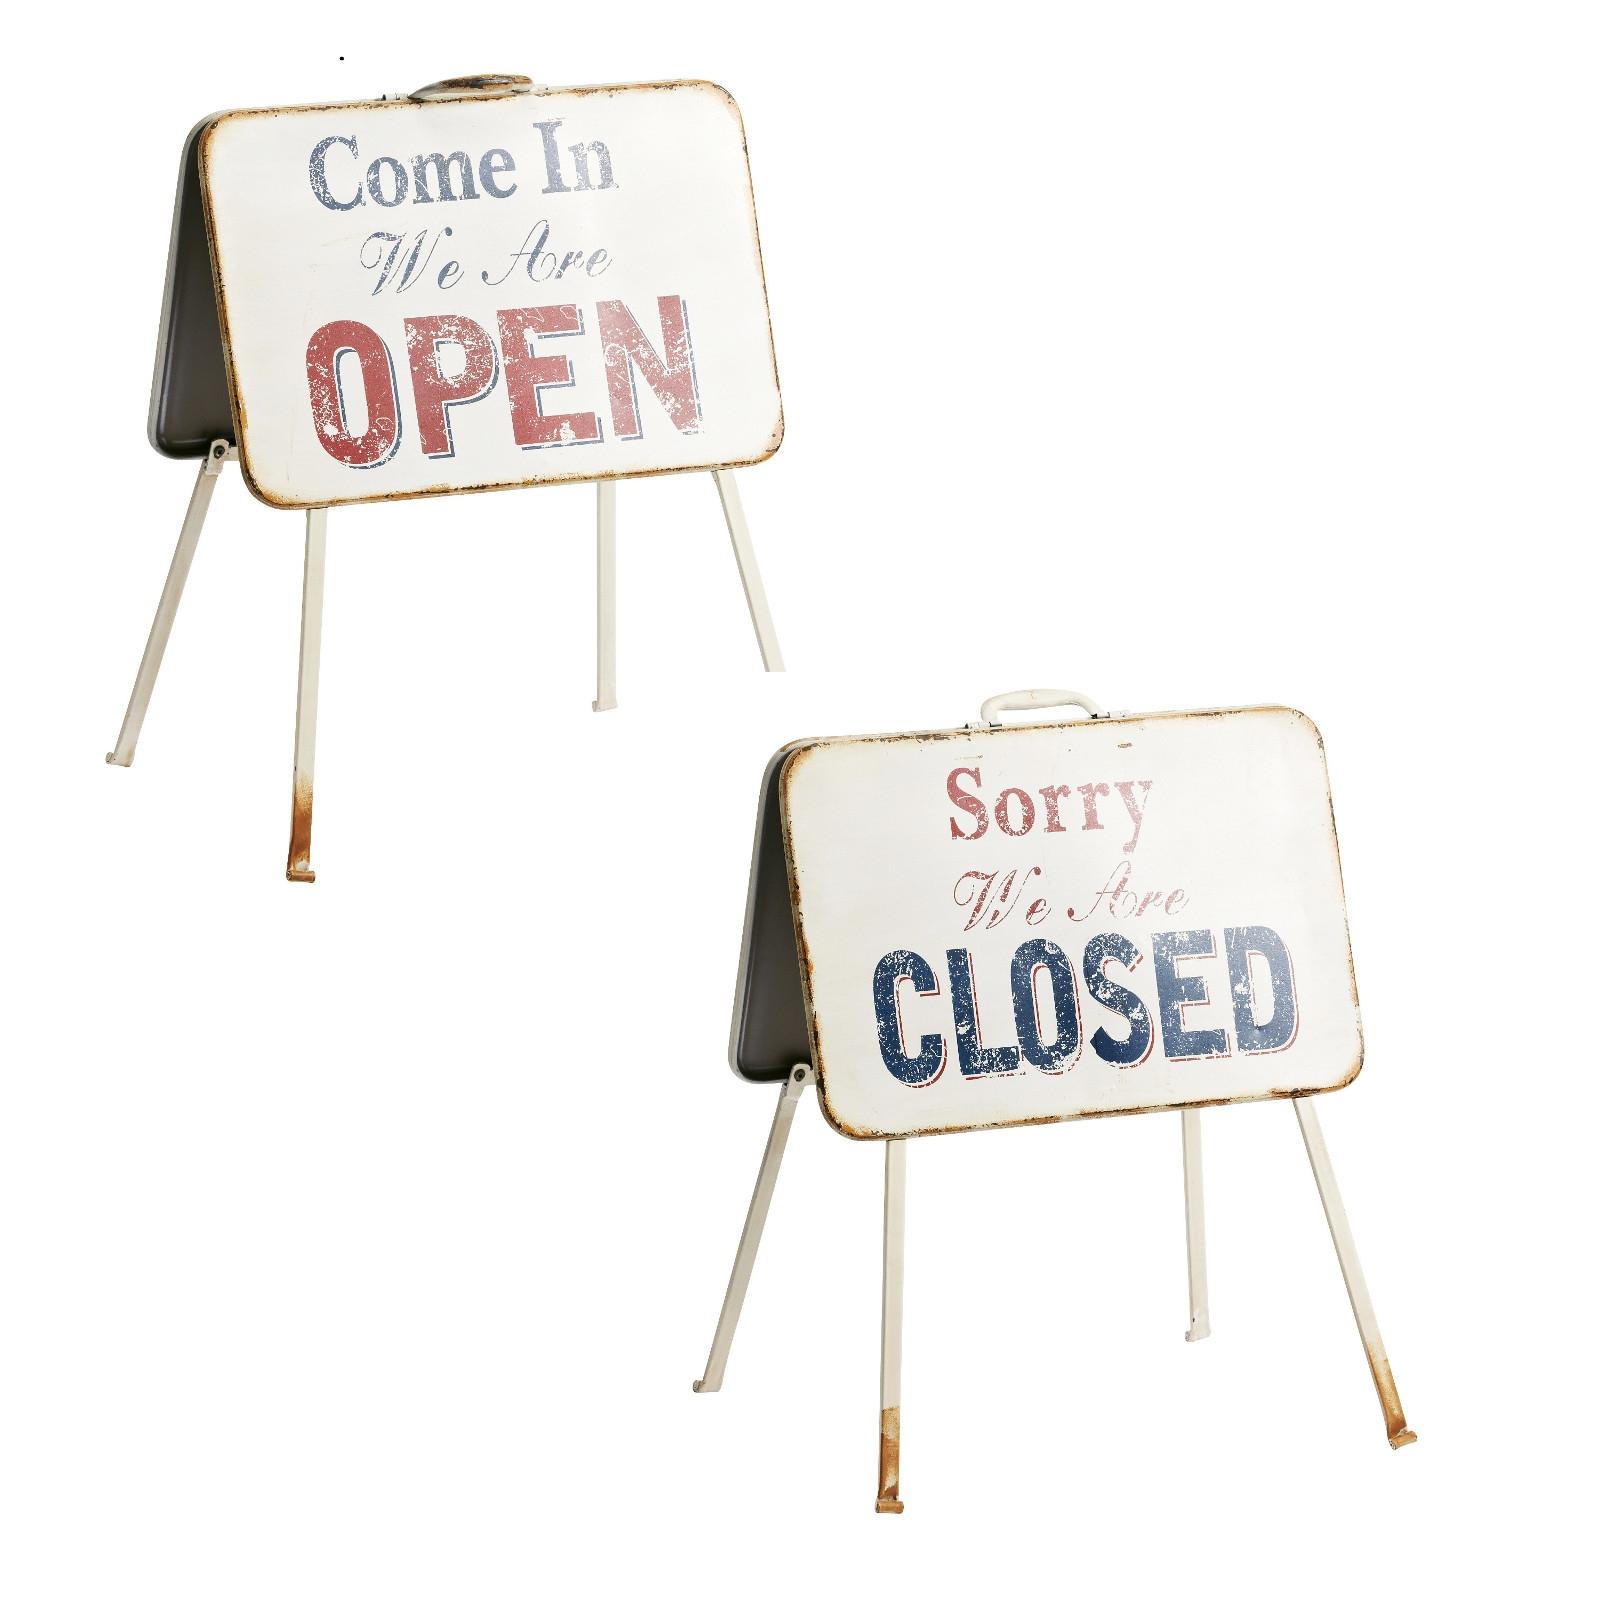 vintage metall schilder open closed tafeln aufsteller f r restaurant bar ebay. Black Bedroom Furniture Sets. Home Design Ideas